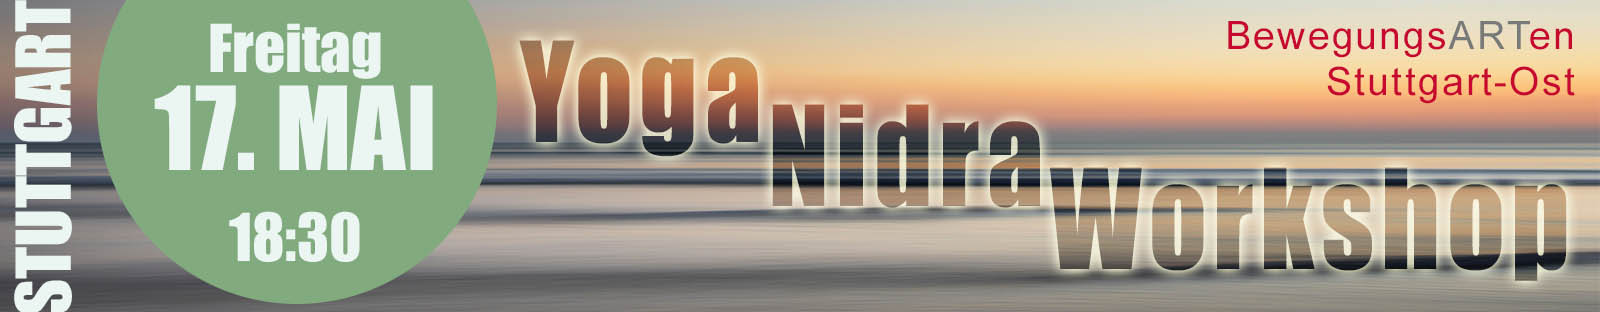 2019 05 17 Yoga Nidra Stuttgart-Ost